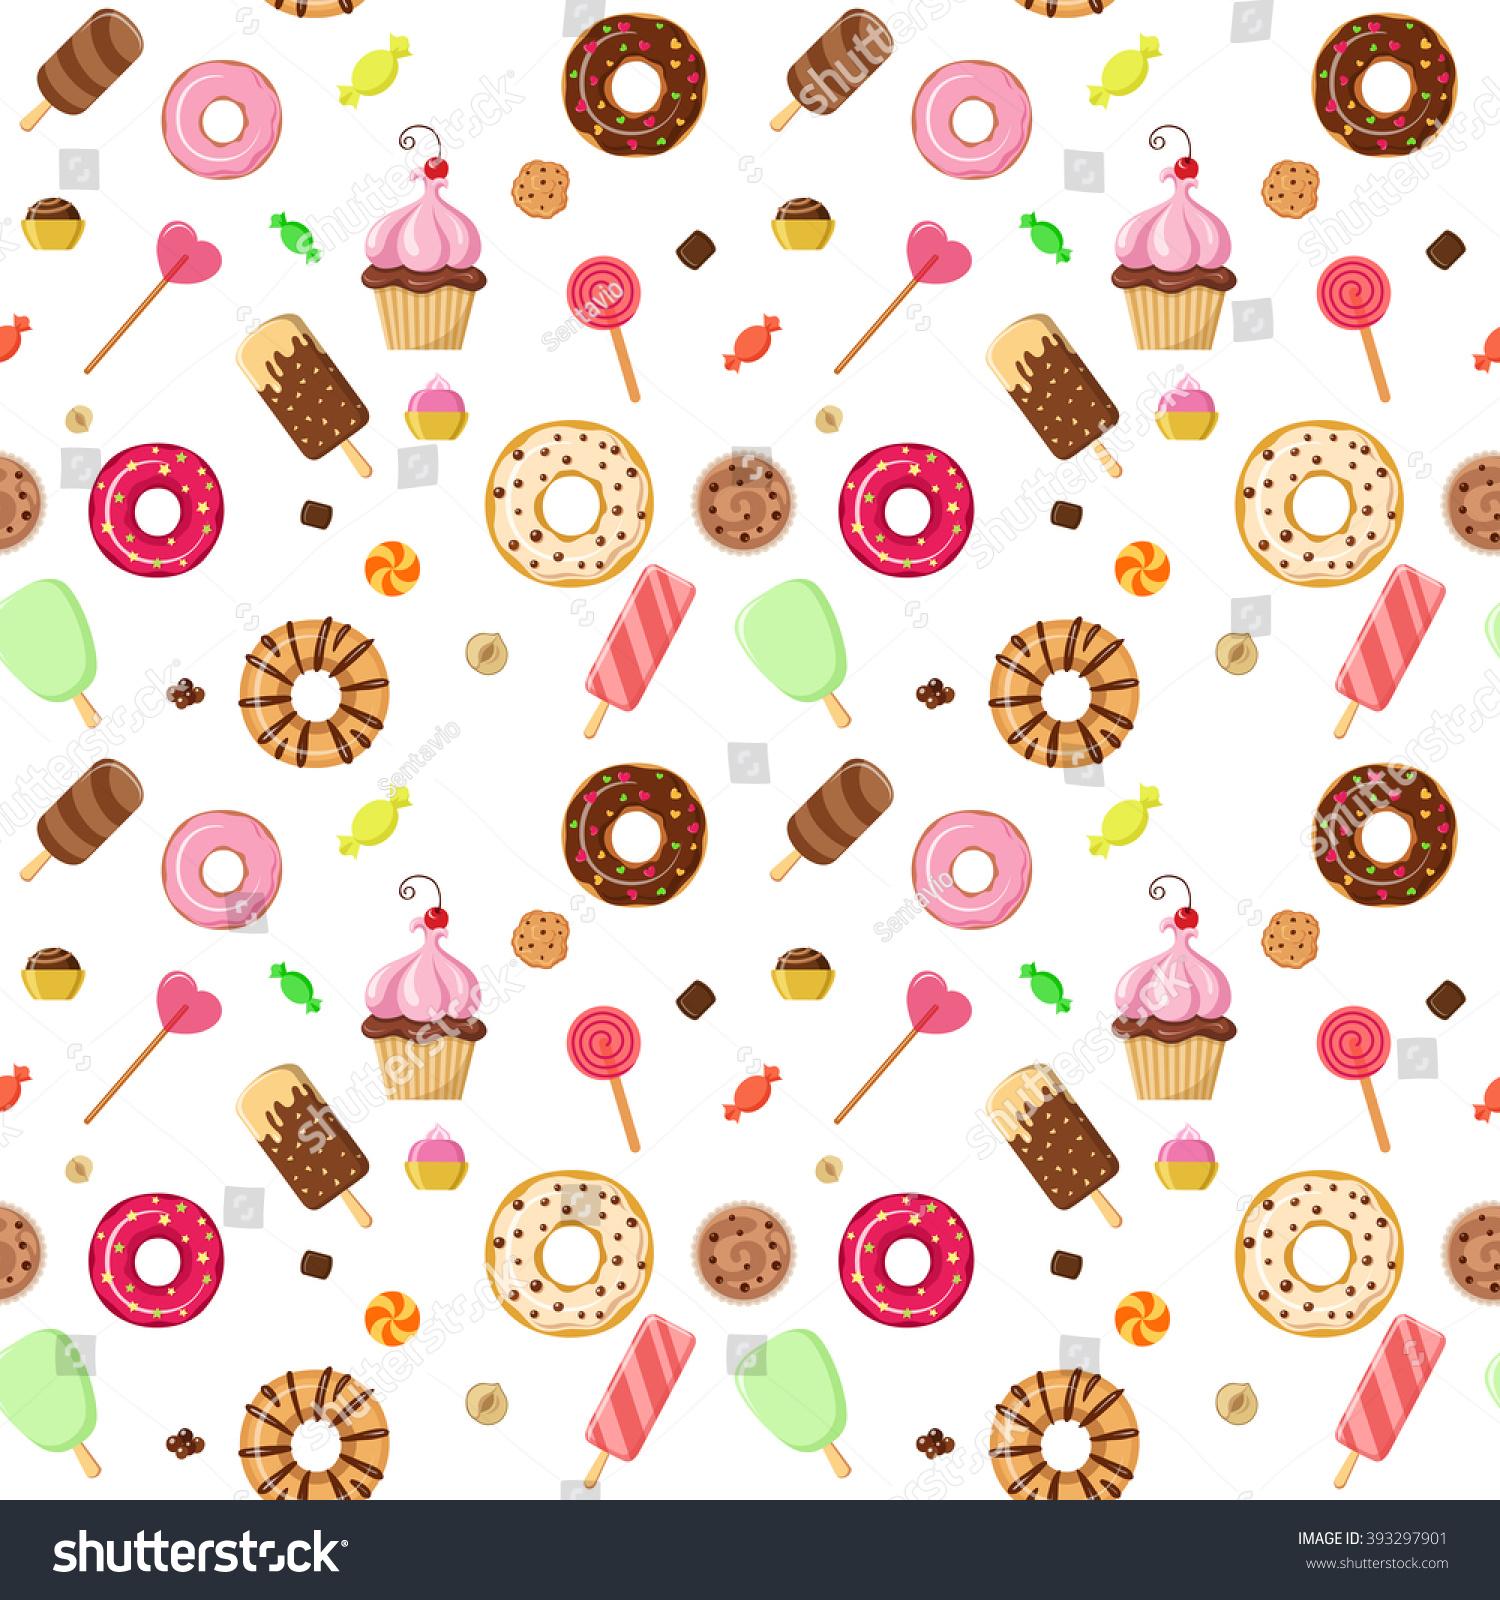 Desserts Ice Cream Wallpapers: Ice Cream Sweet Dessert Donut Cookie… Stock Photo